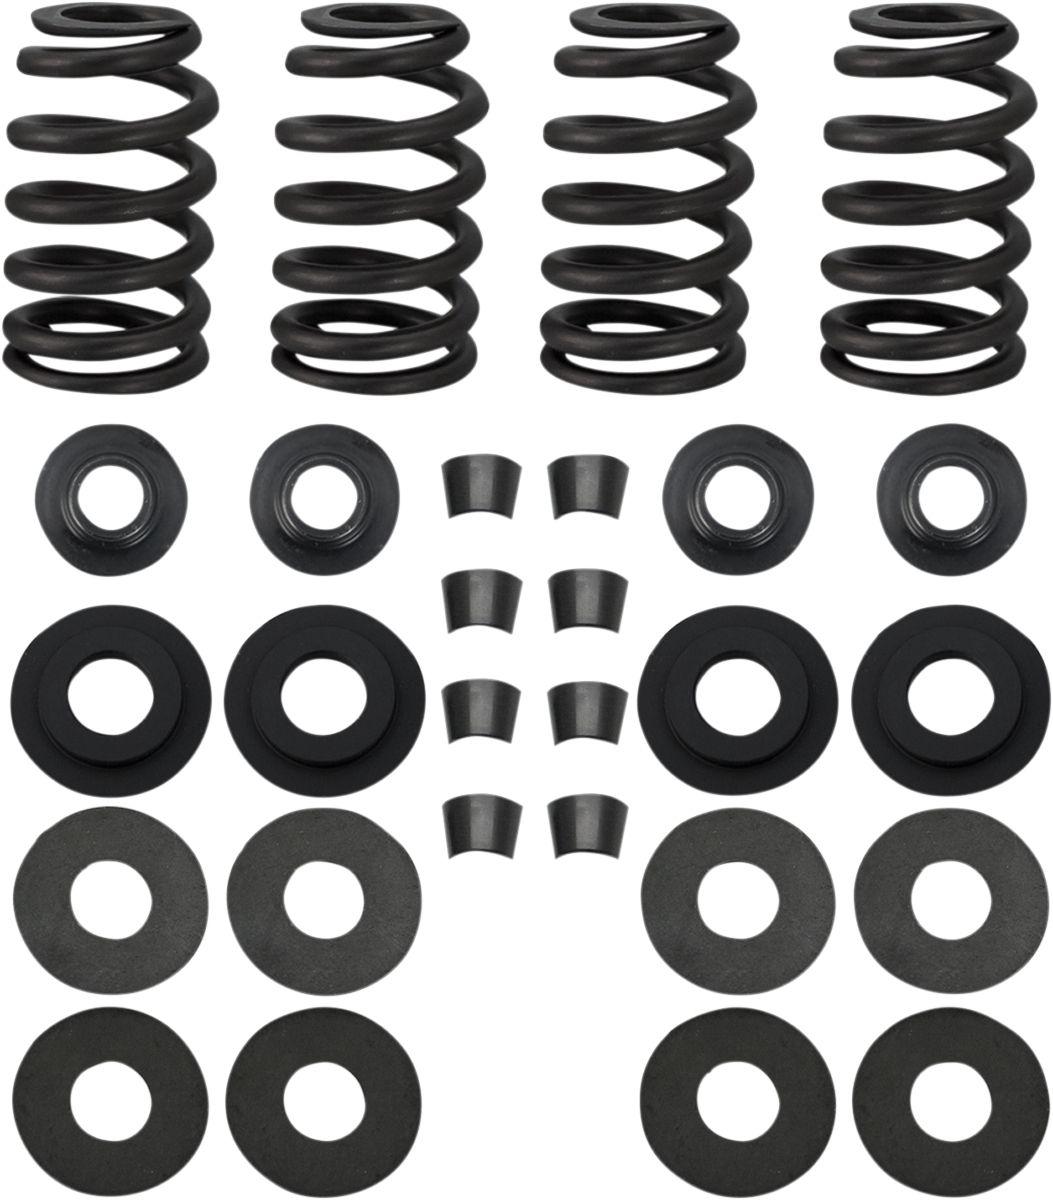 "【S&S CYCLE】汽門彈簧套件/ .585"" 99-04TC 【SPRINGS .585""99-04TC [0926-2722]】 - 「Webike-摩托百貨」"